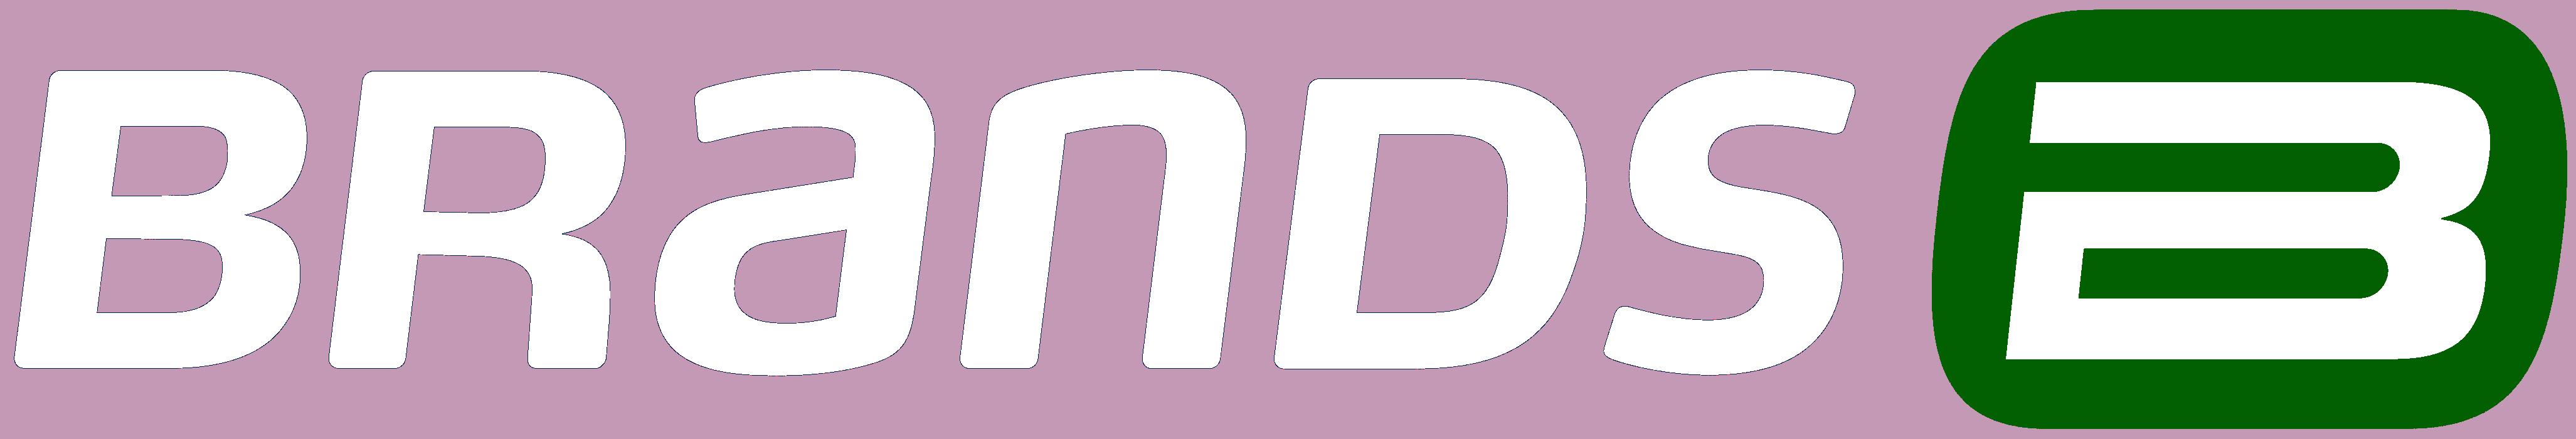 ERP (LOGISTIK) MANAGER (M/W/D) - Job Buchholz i.d.N. - Werden Sie Teil unseres Teams - Post offer form